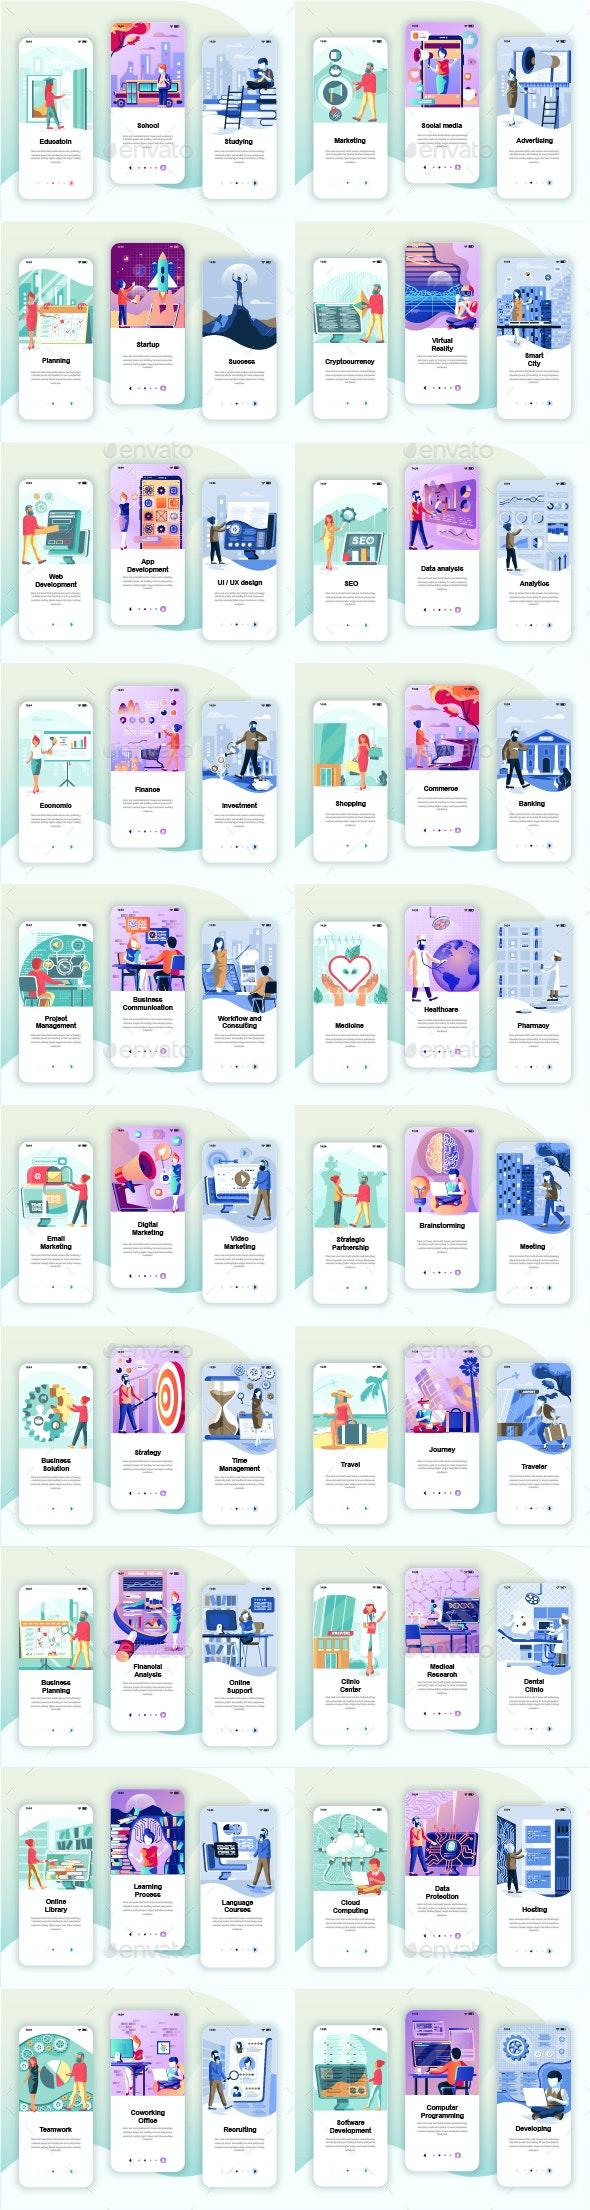 Instagram Stories Mobile App - Web Elements Vectors